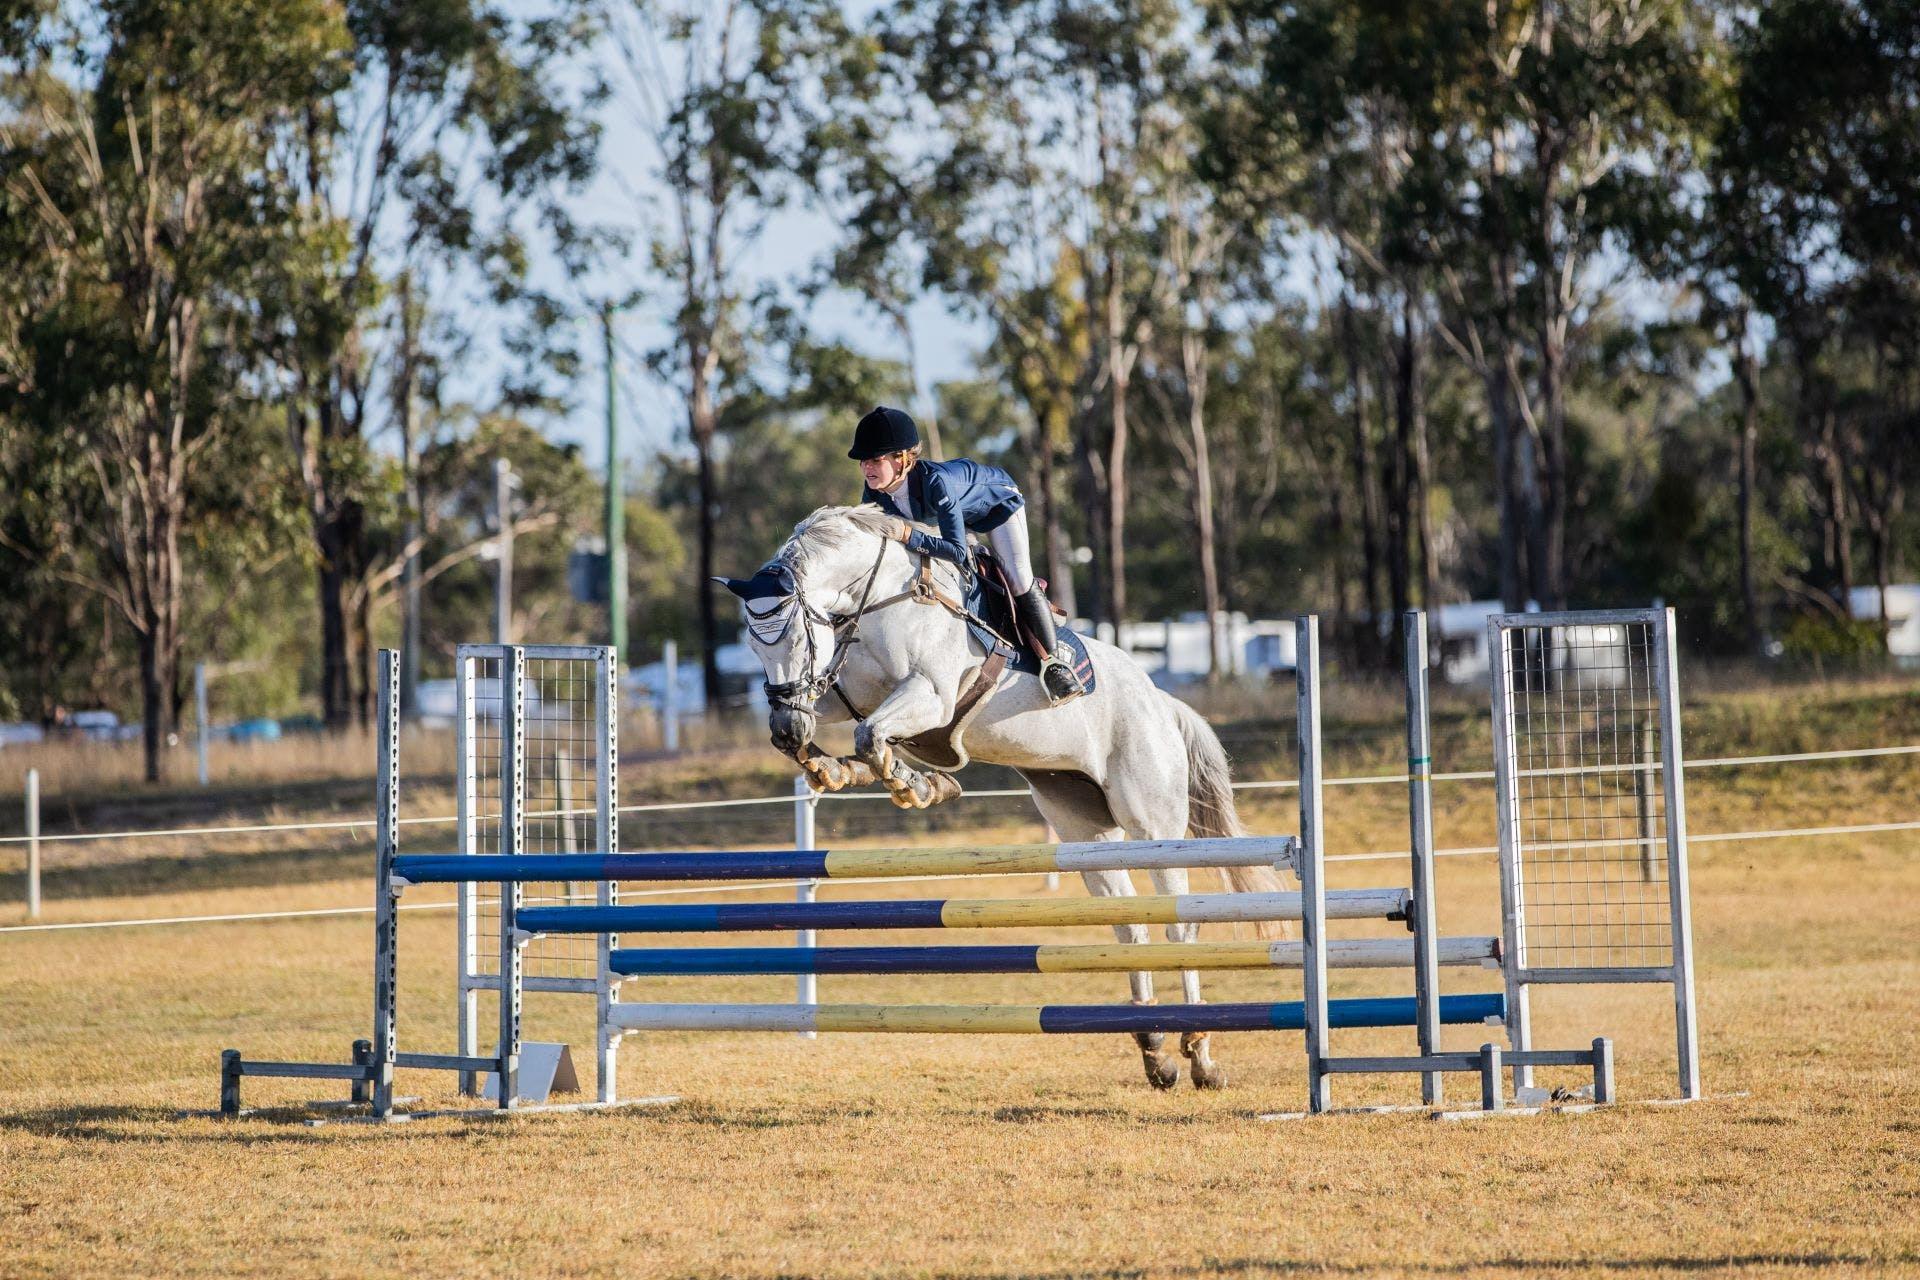 qric - horse rider jumping